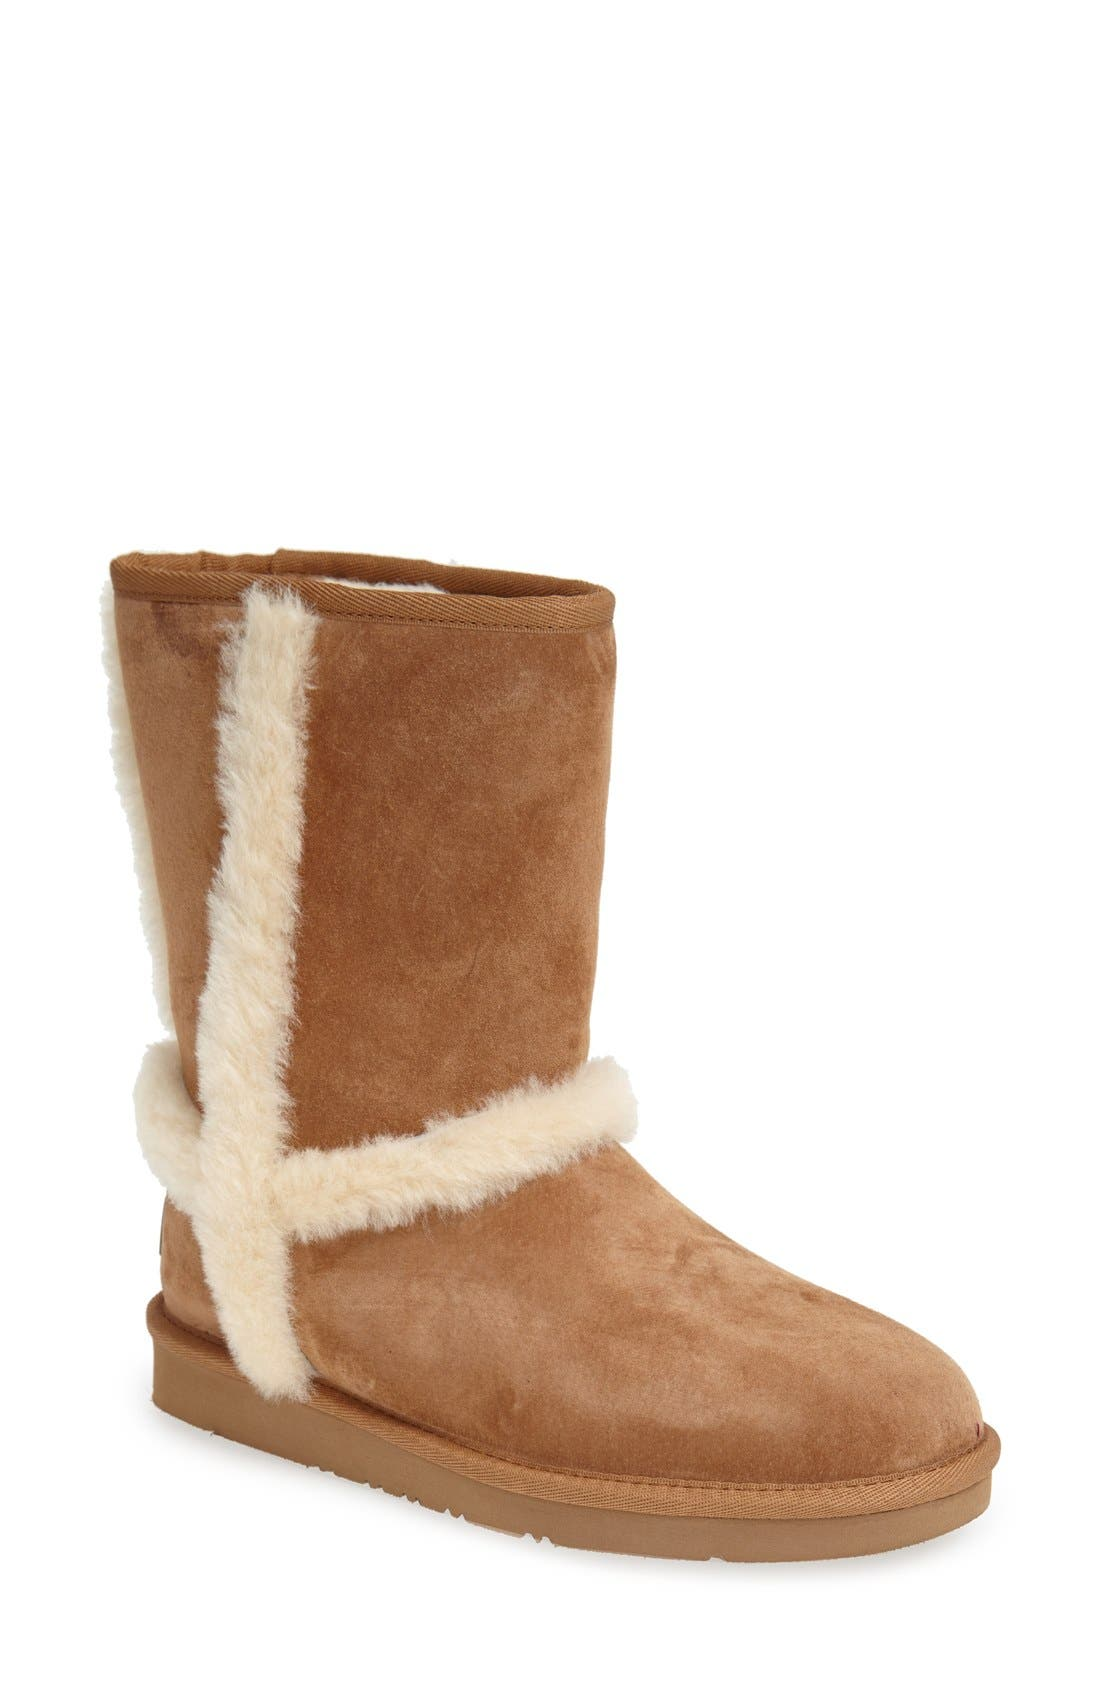 Main Image - UGG® 'Carter' Boot (Women)